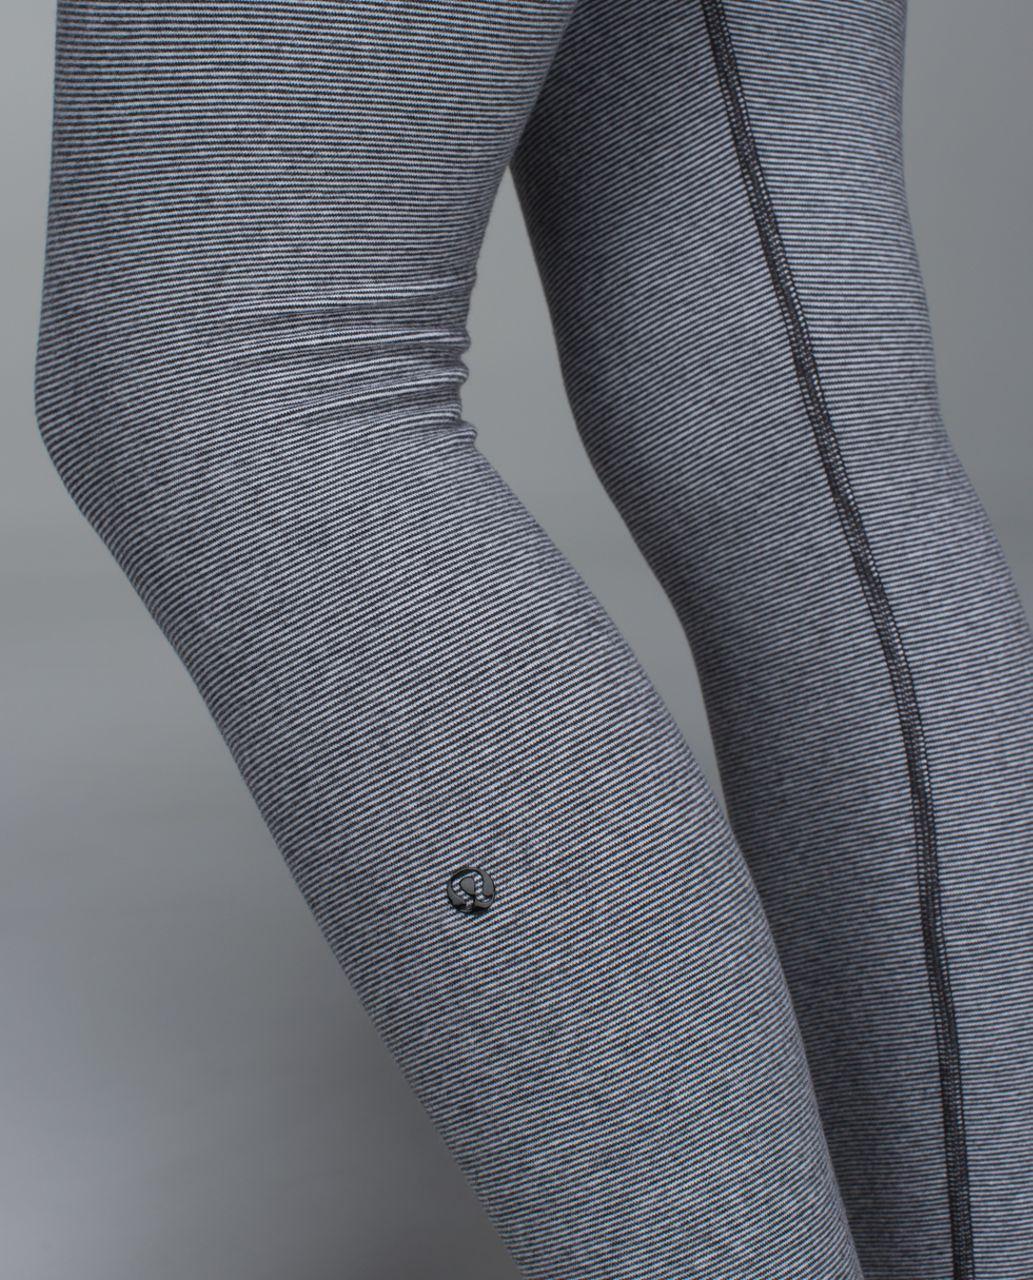 Lululemon Wunder Under Pant *Cotton (Roll Down) - Wee Stripe Heathered Black White